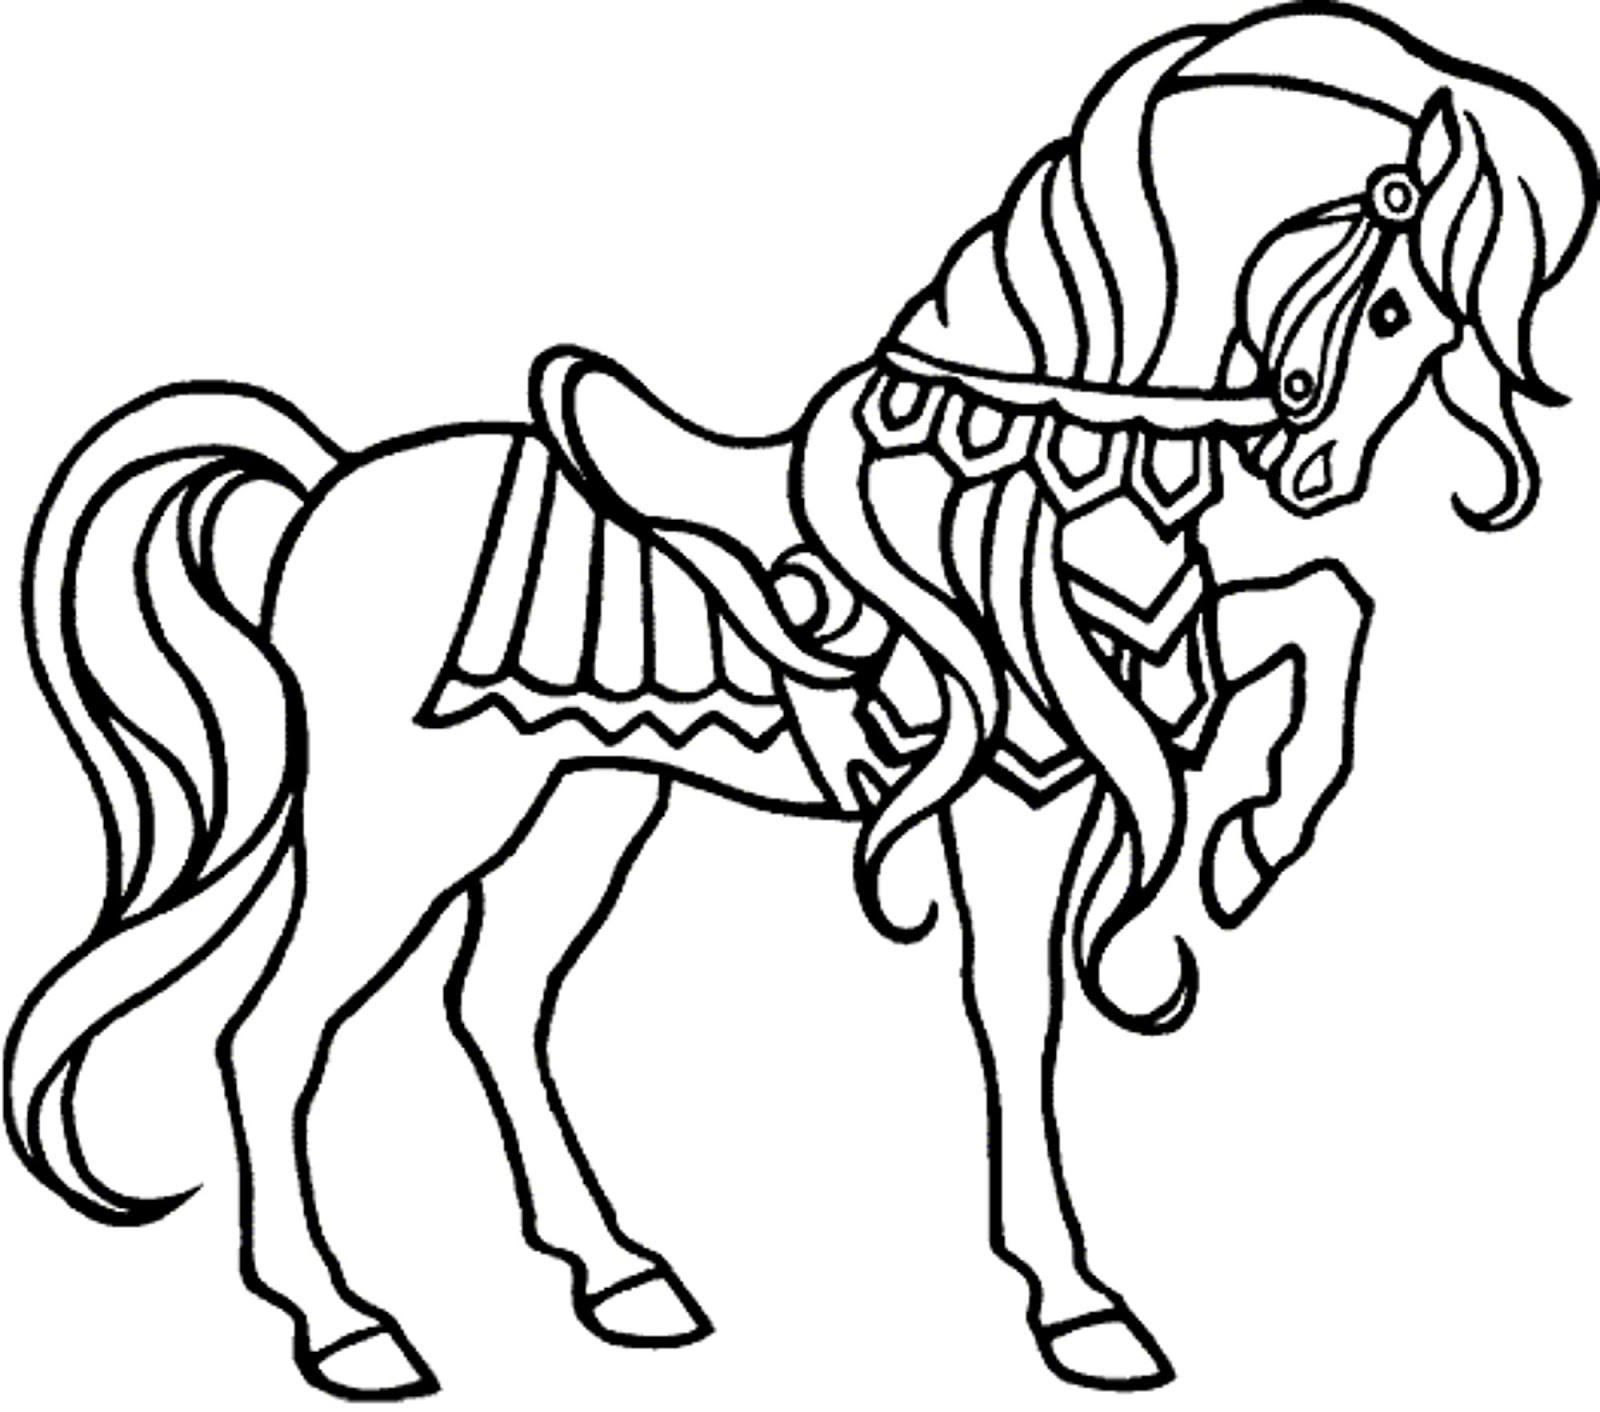 Mewarnai Kuda Pony Mewarnai Gambar Pemandangan Mewarnai Gambar Kartun Mewarnai Gambar Masjid